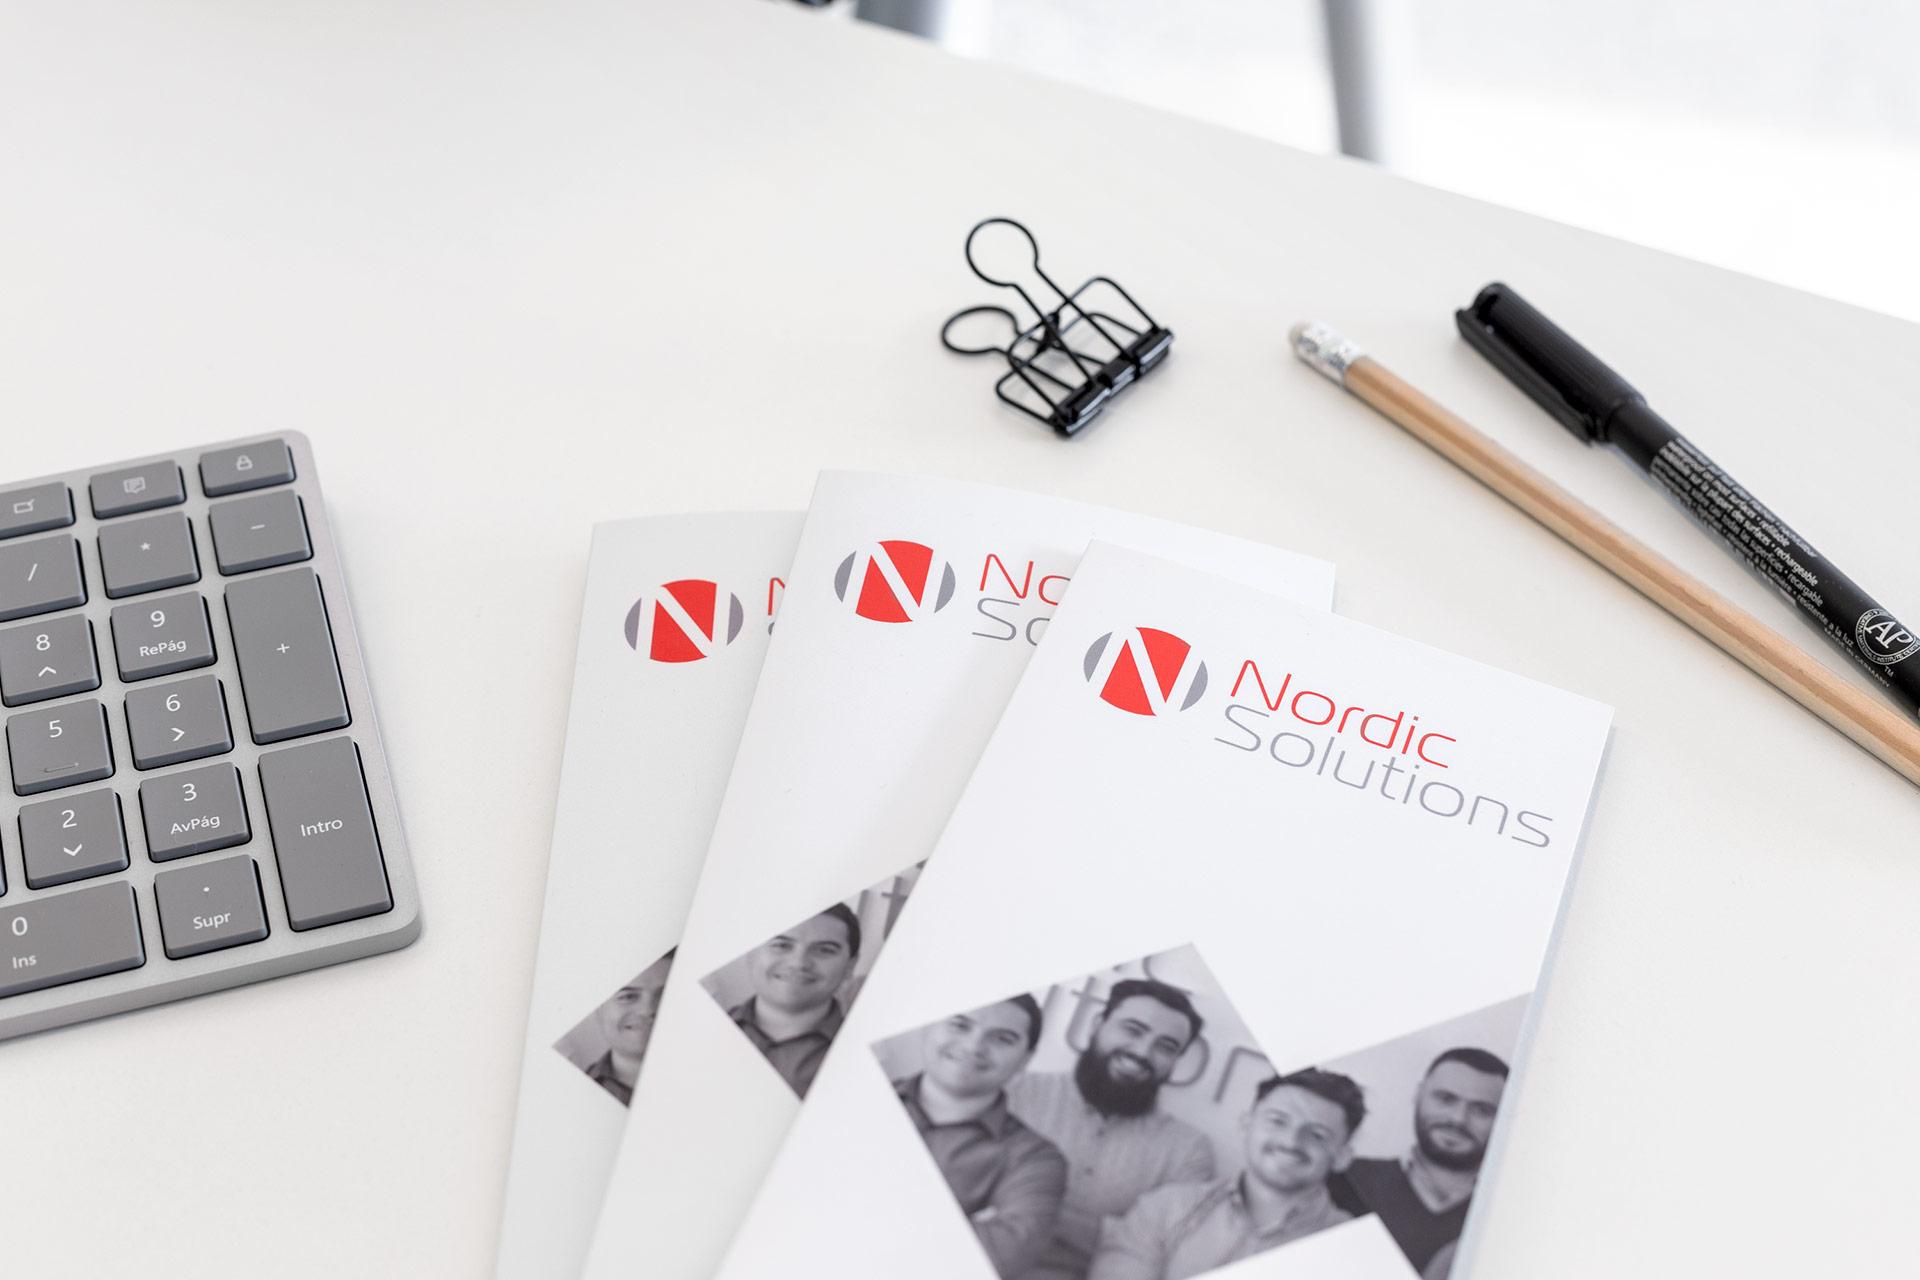 nordic-solutions-7088.jpg